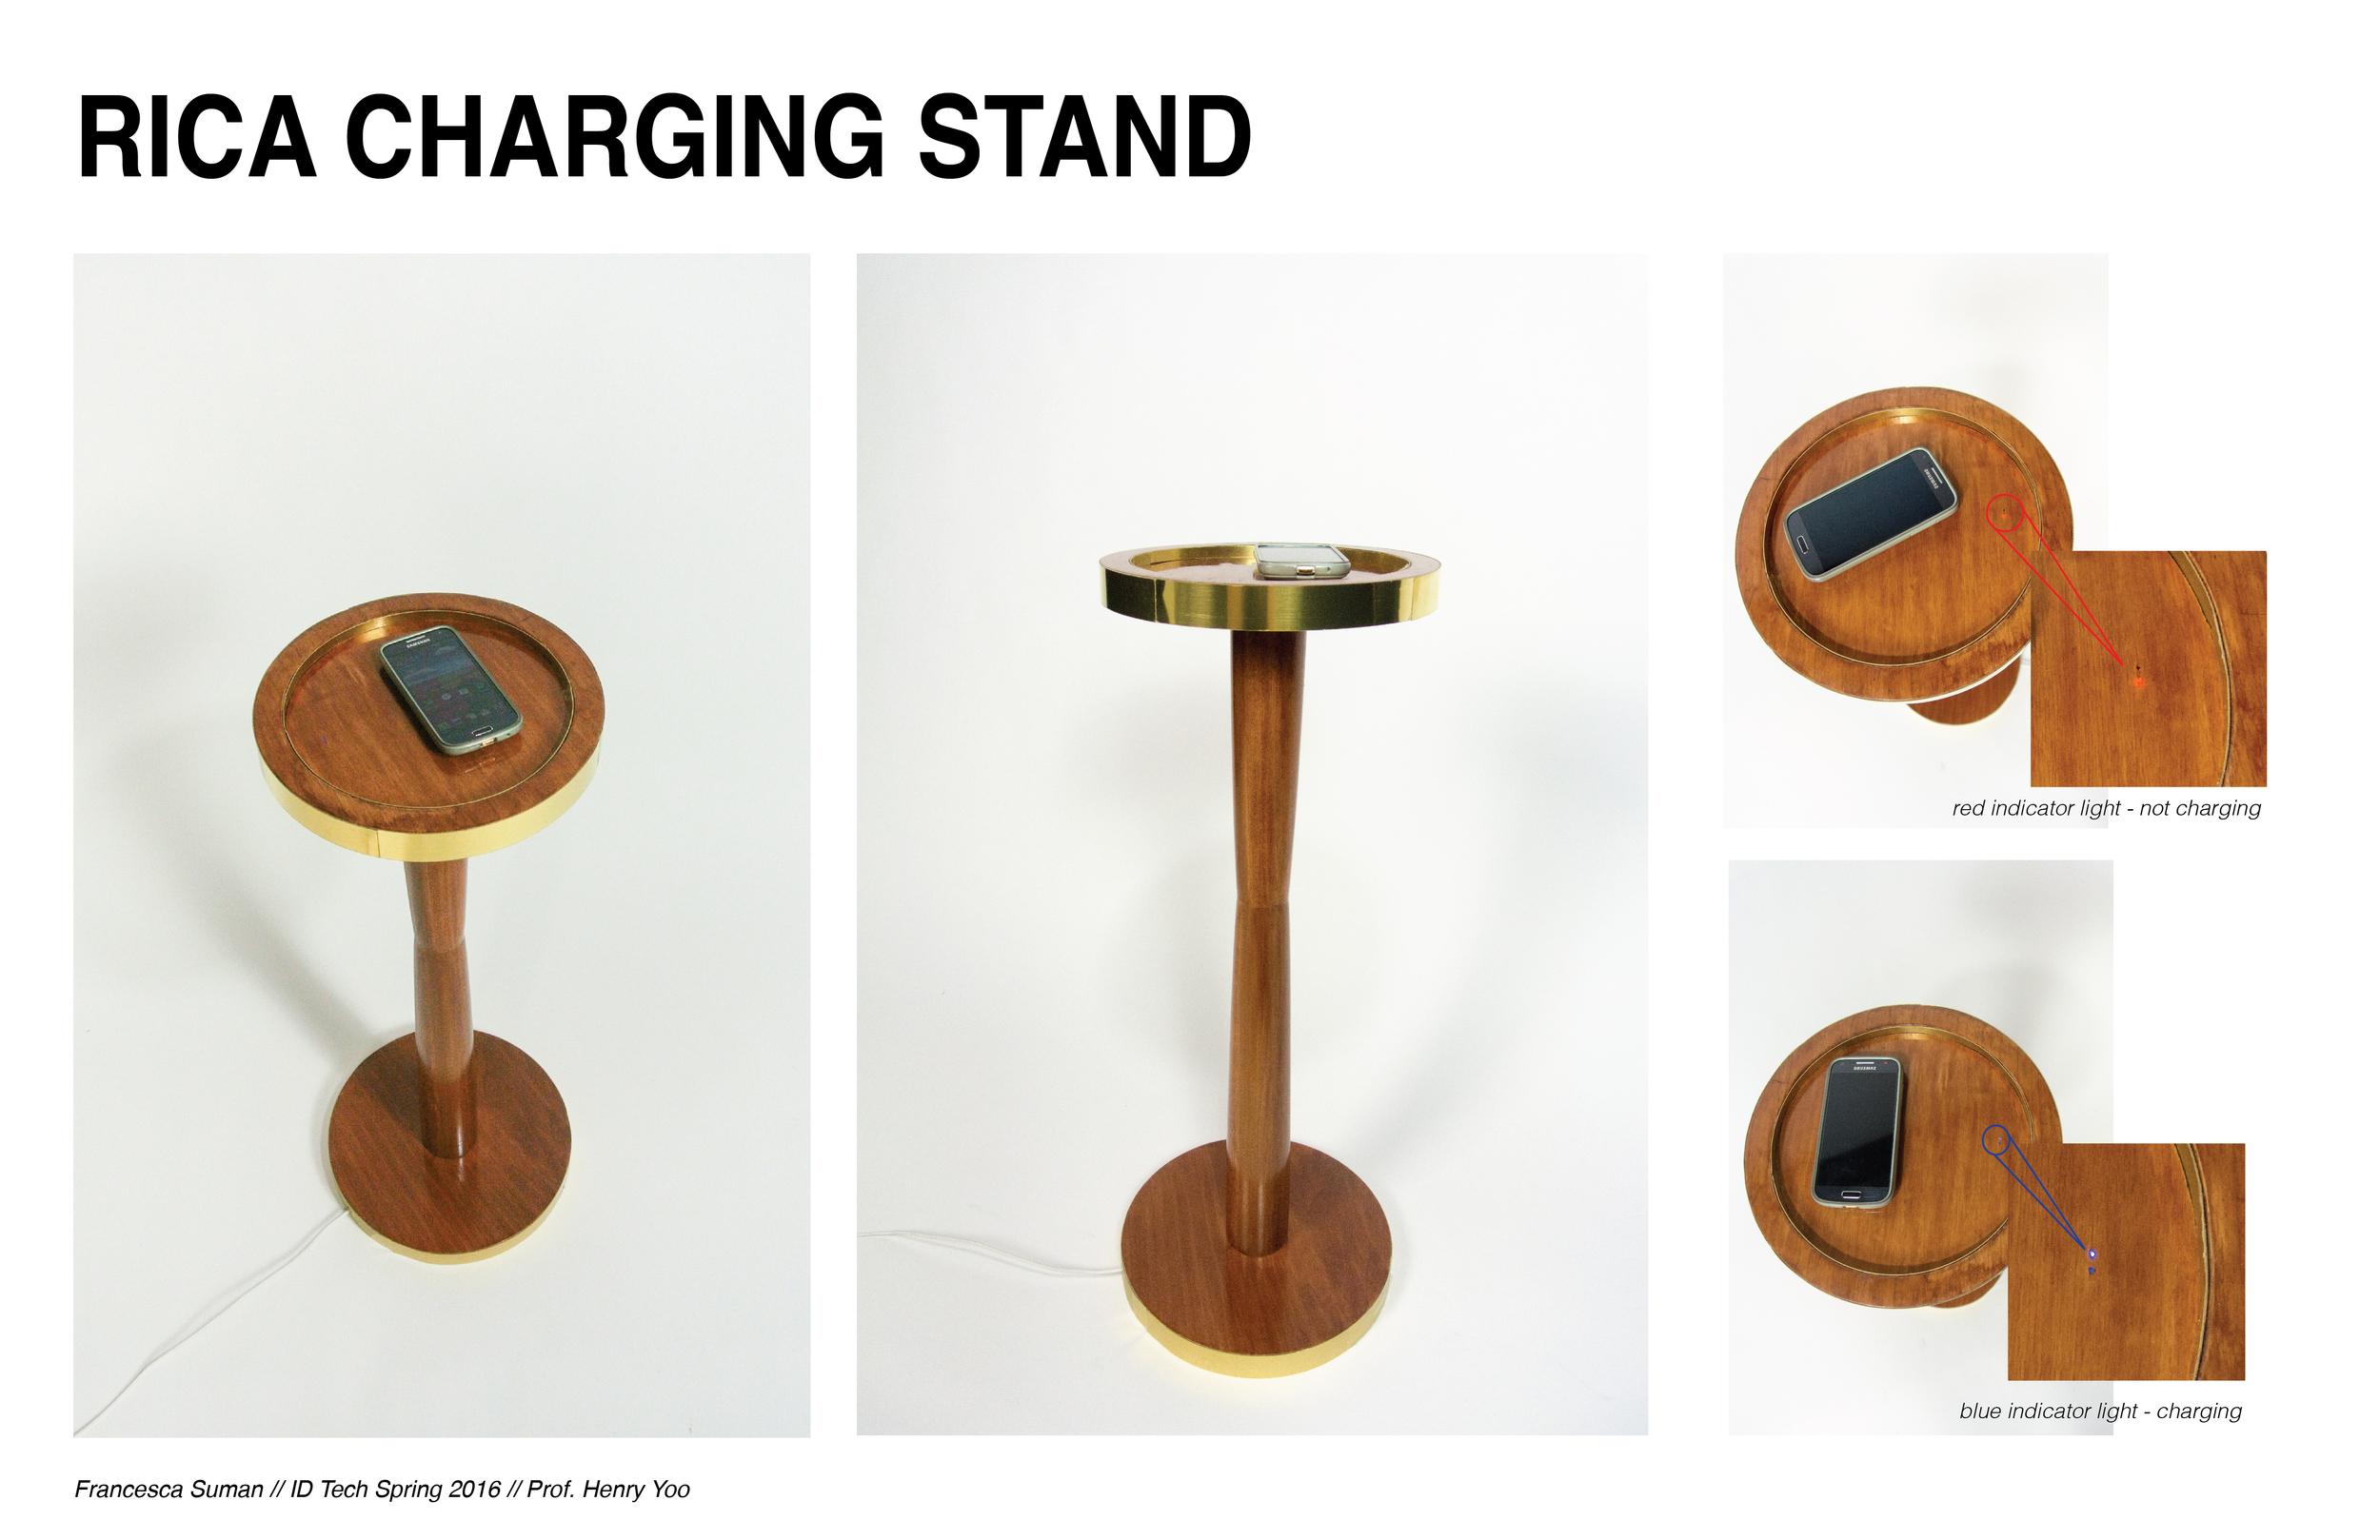 chargerstandboards-06.jpg